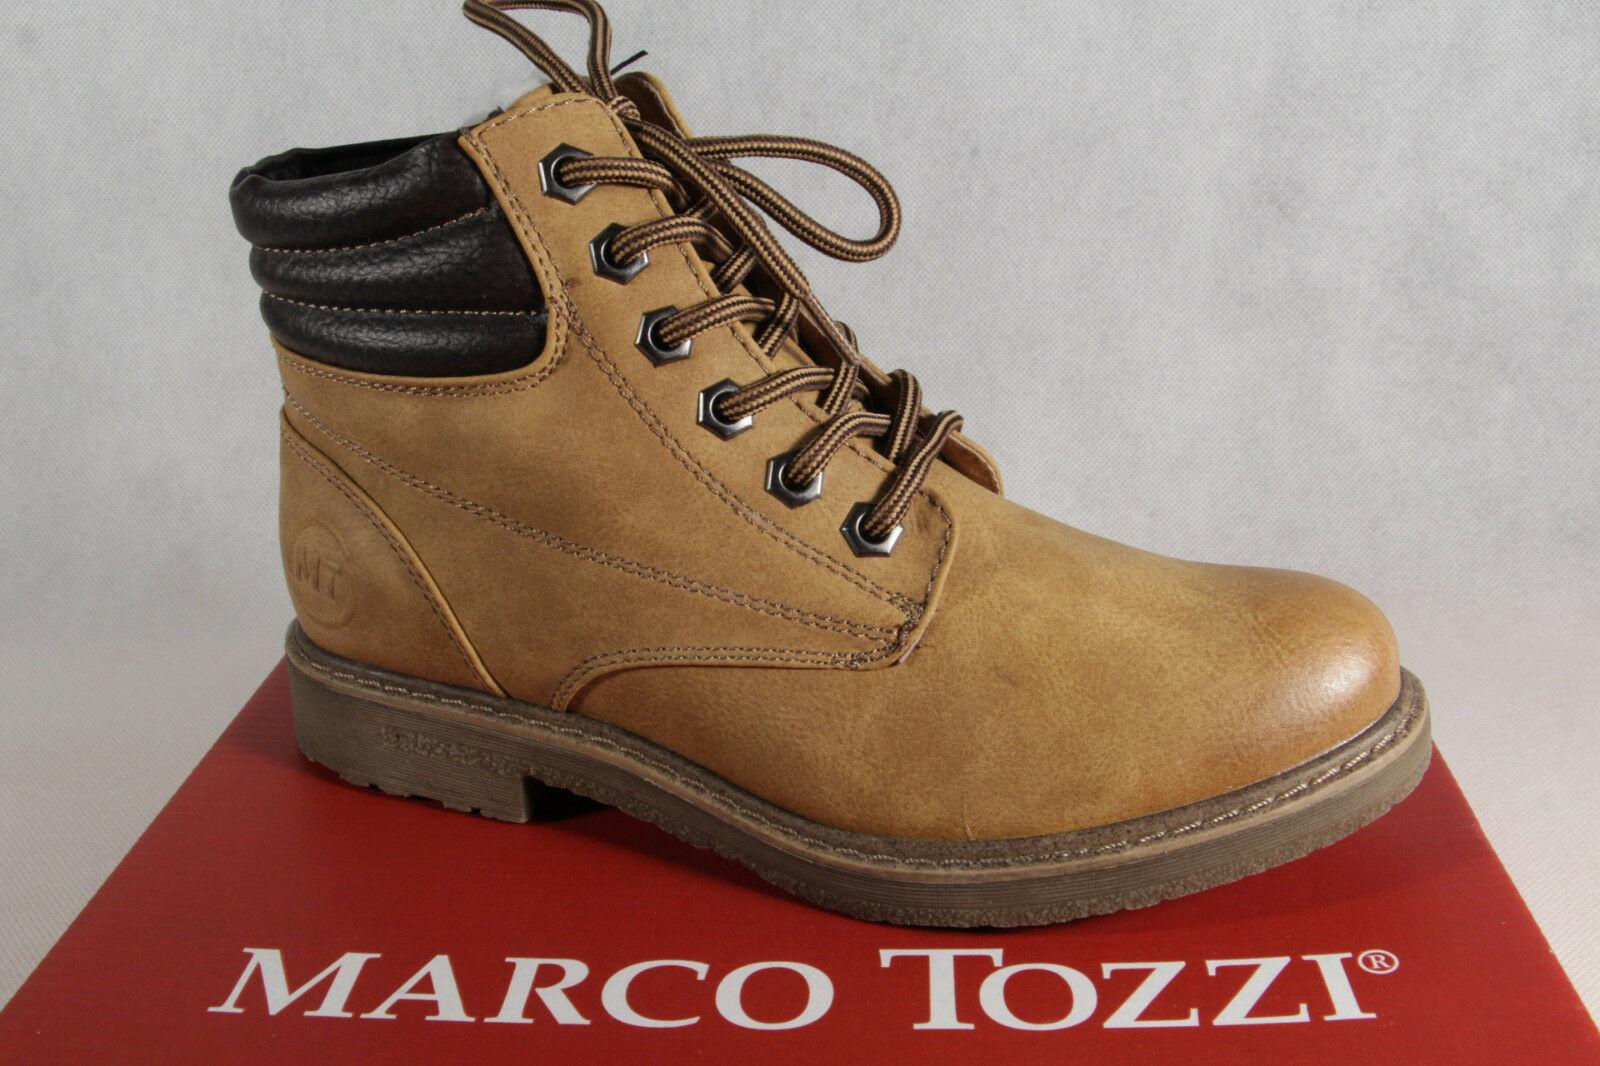 competitive price a9fb1 490e1 Marco Tozzi Stiefel, Stiefel, braun, gefüttert, RV 46203 NEU!!